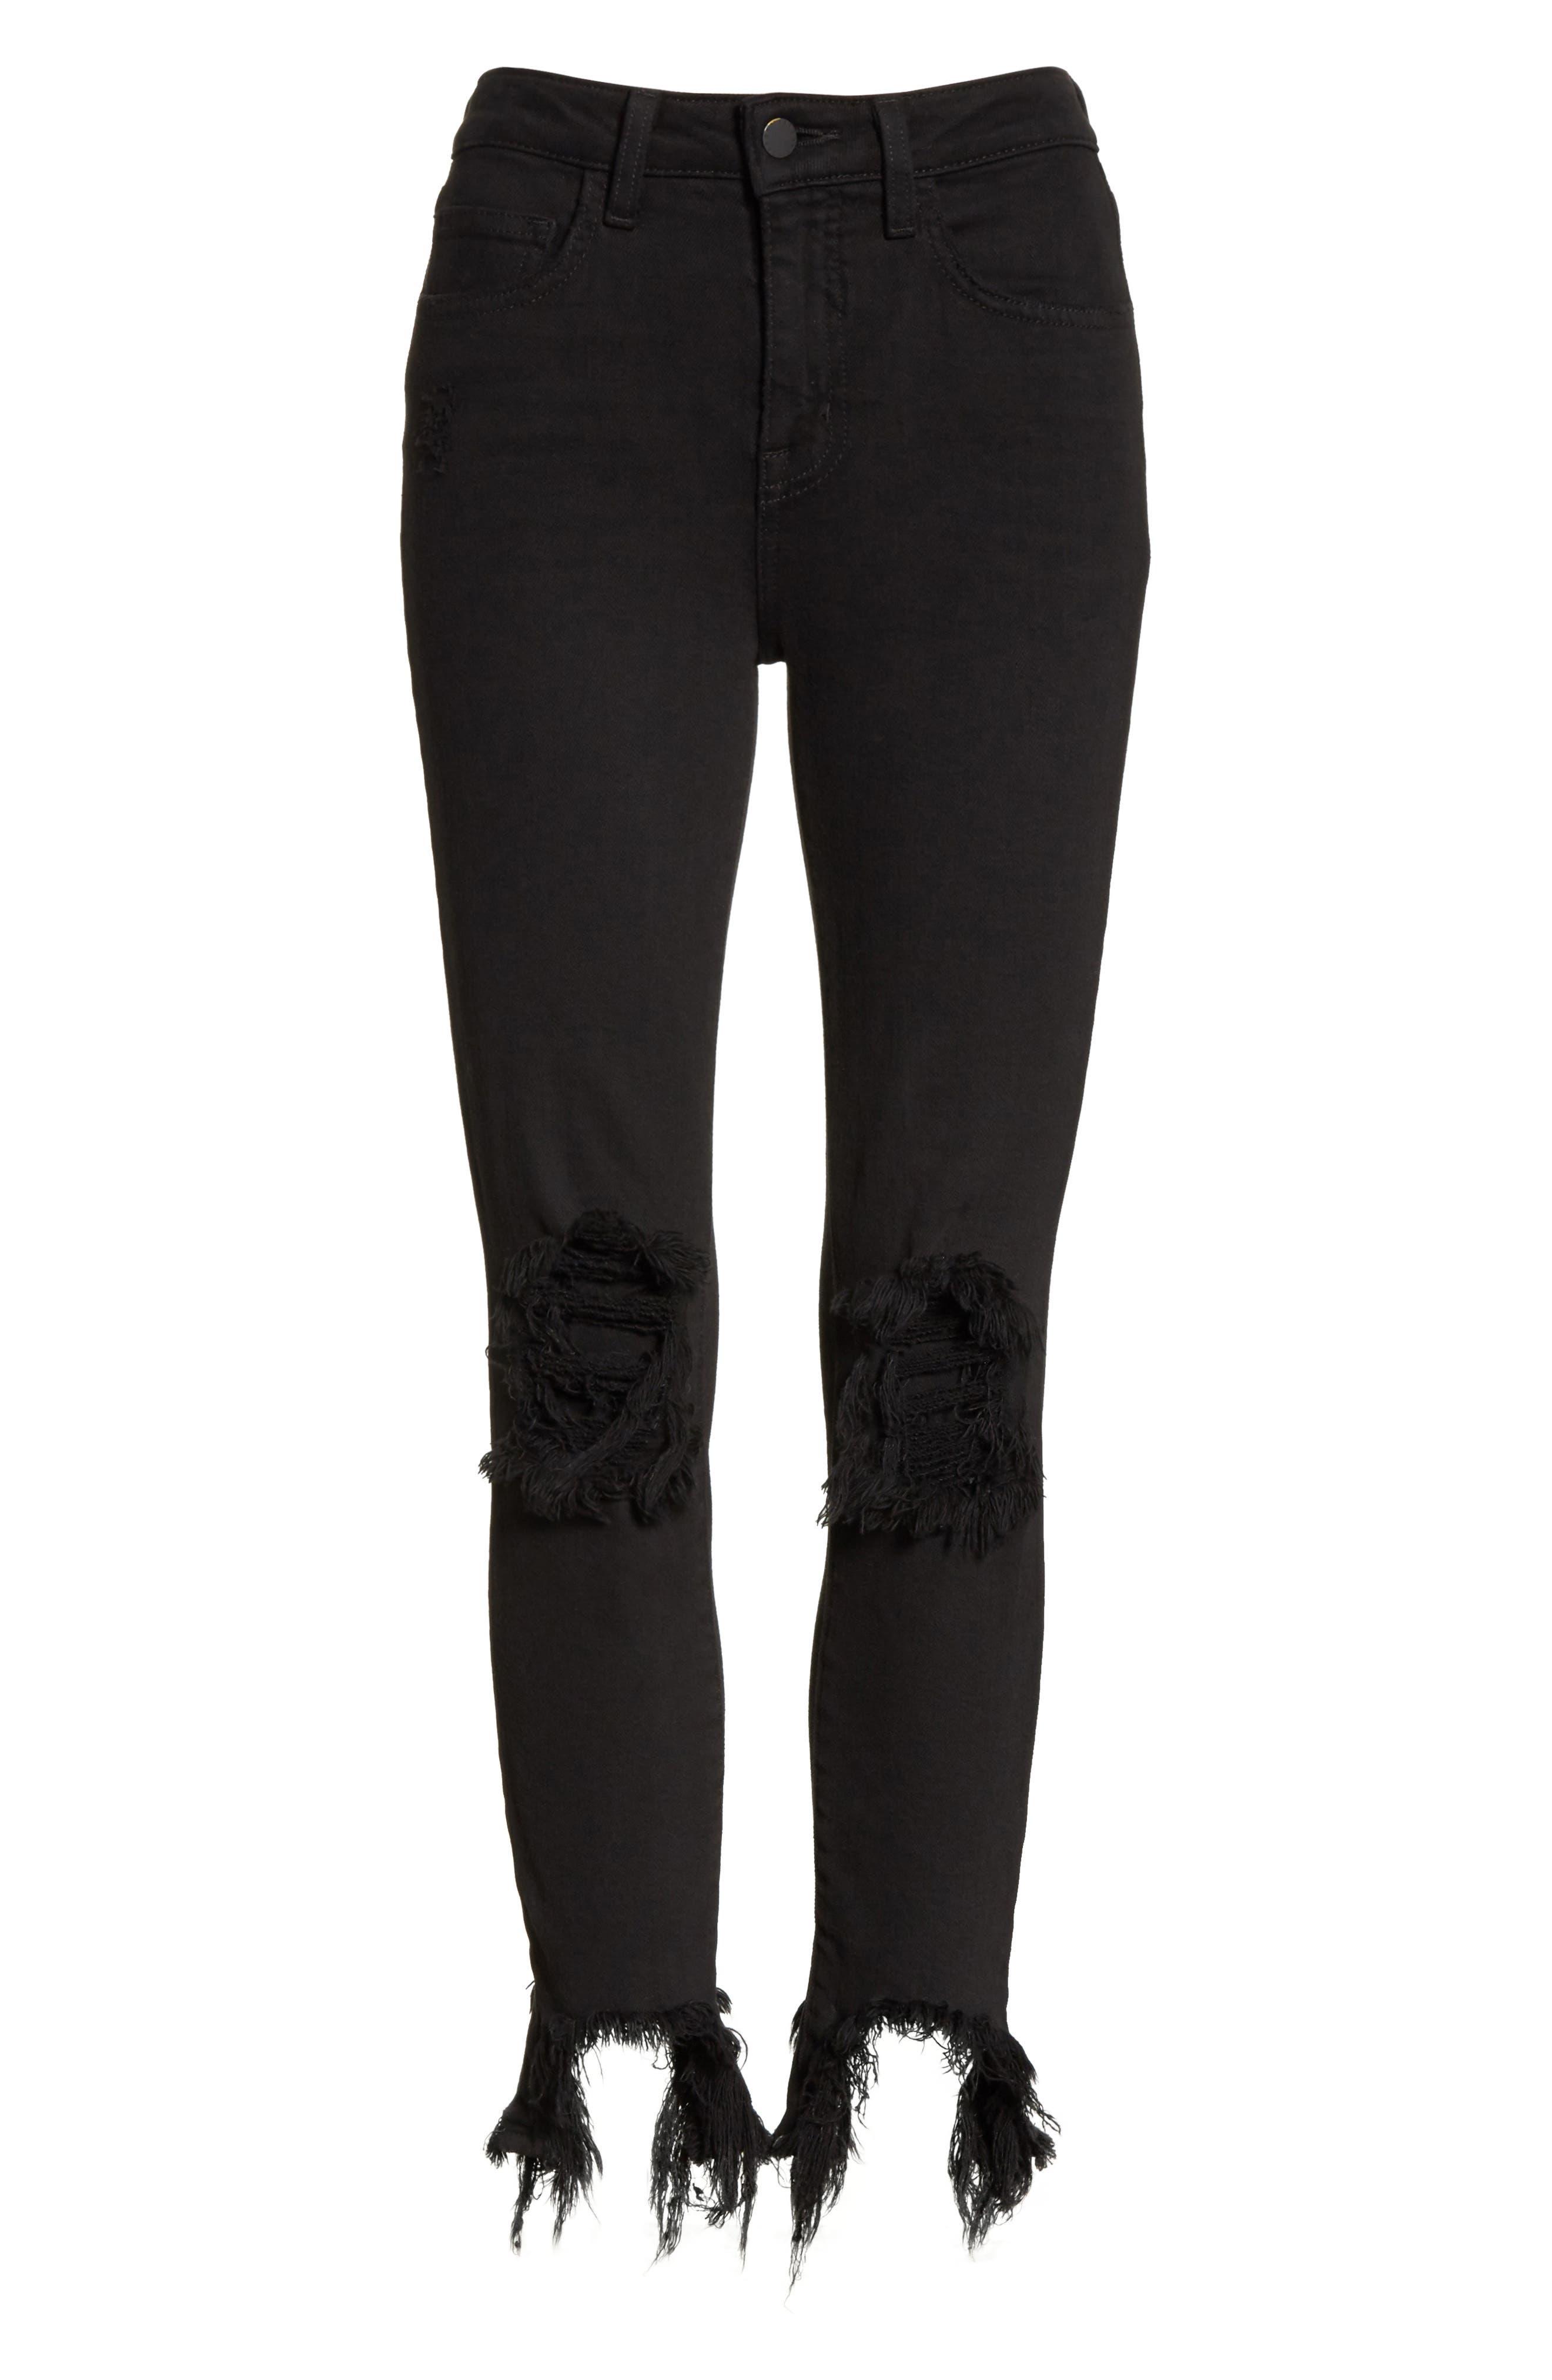 L'AGENCE, Highline High Waist Fray Hem Skinny Jeans, Alternate thumbnail 7, color, SATURATED BLACK DESTRUCT